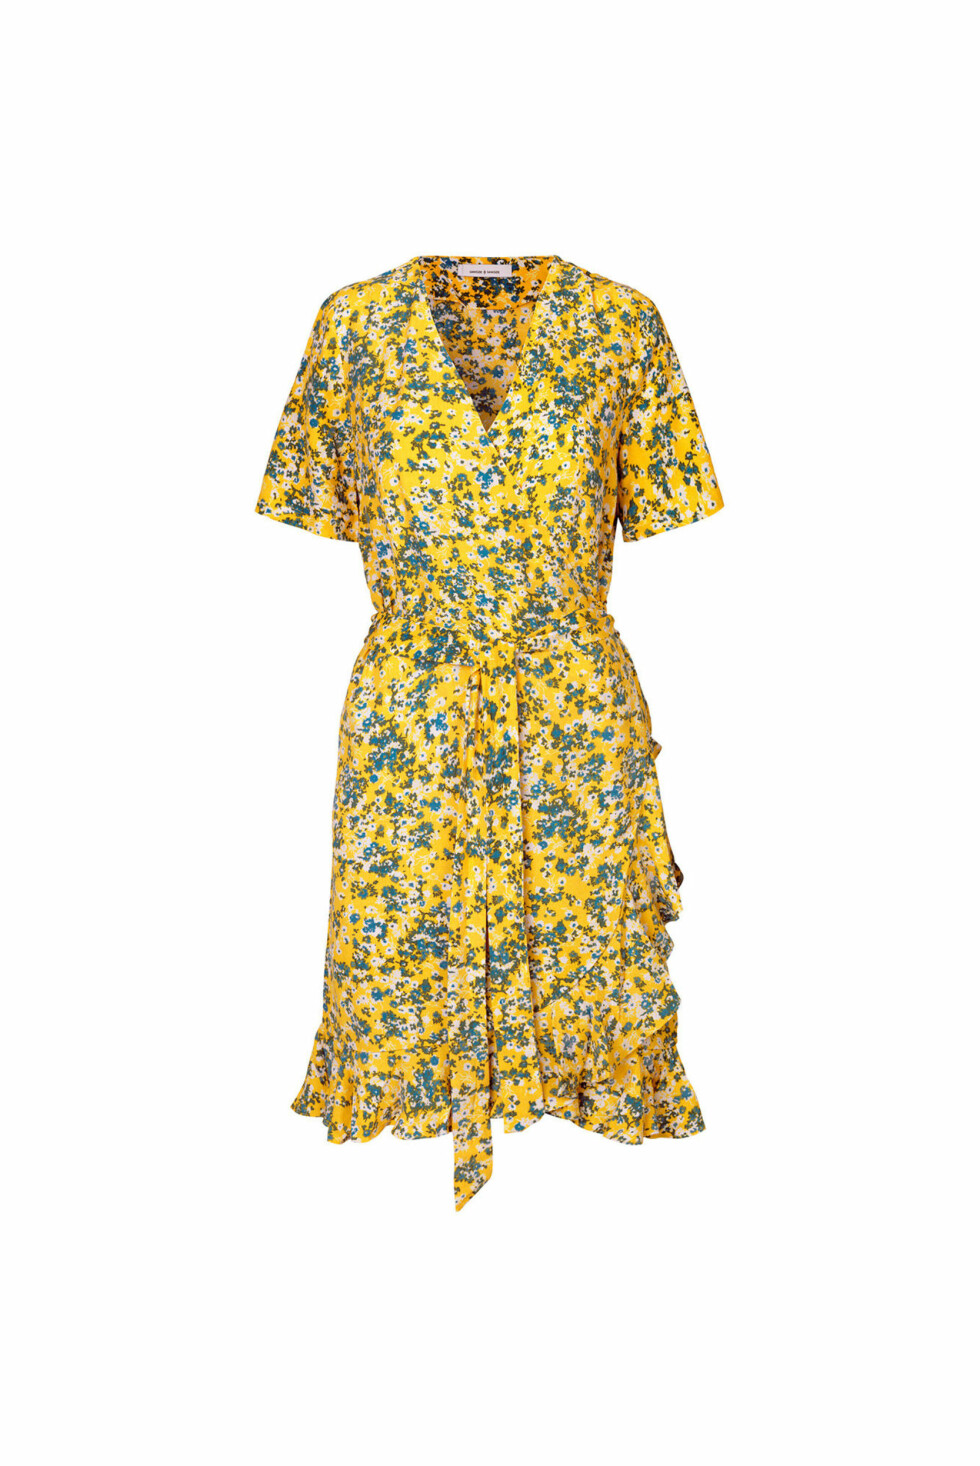 Kjole fra Samsøe Samsøe |800,-| https://www.samsoe.com/da/woman/apparel/dresses/midi-dresses/limon-ss-dress-aop-6515/F18202900.html?dwvar_F18202900_color=SOLEIL%20JARDIN&dwvar_F18202900_size=XXS